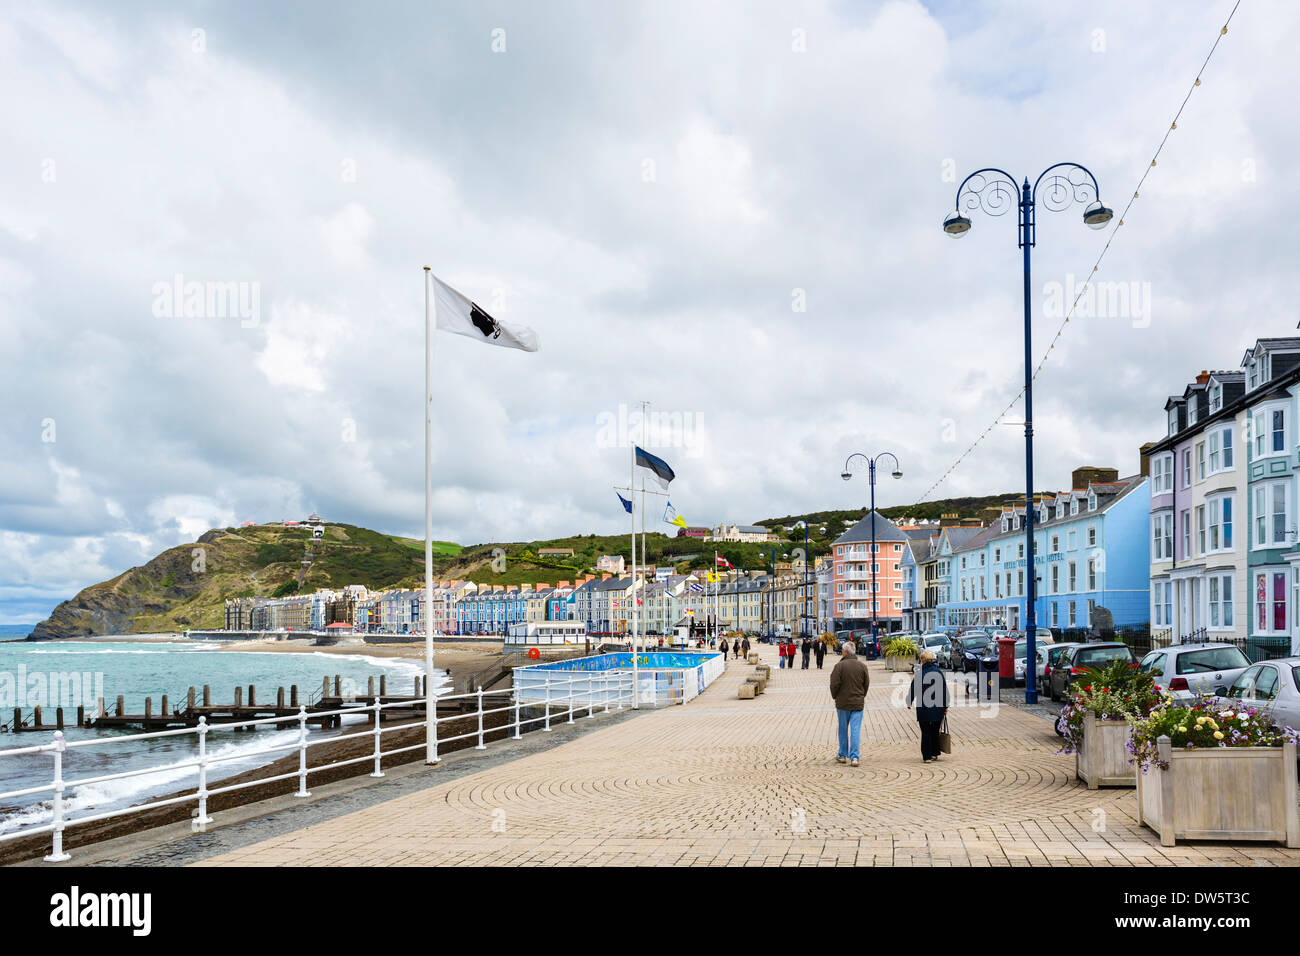 The seafront promenade at Aberystwyth, Ceredigion, Wales, UK - Stock Image